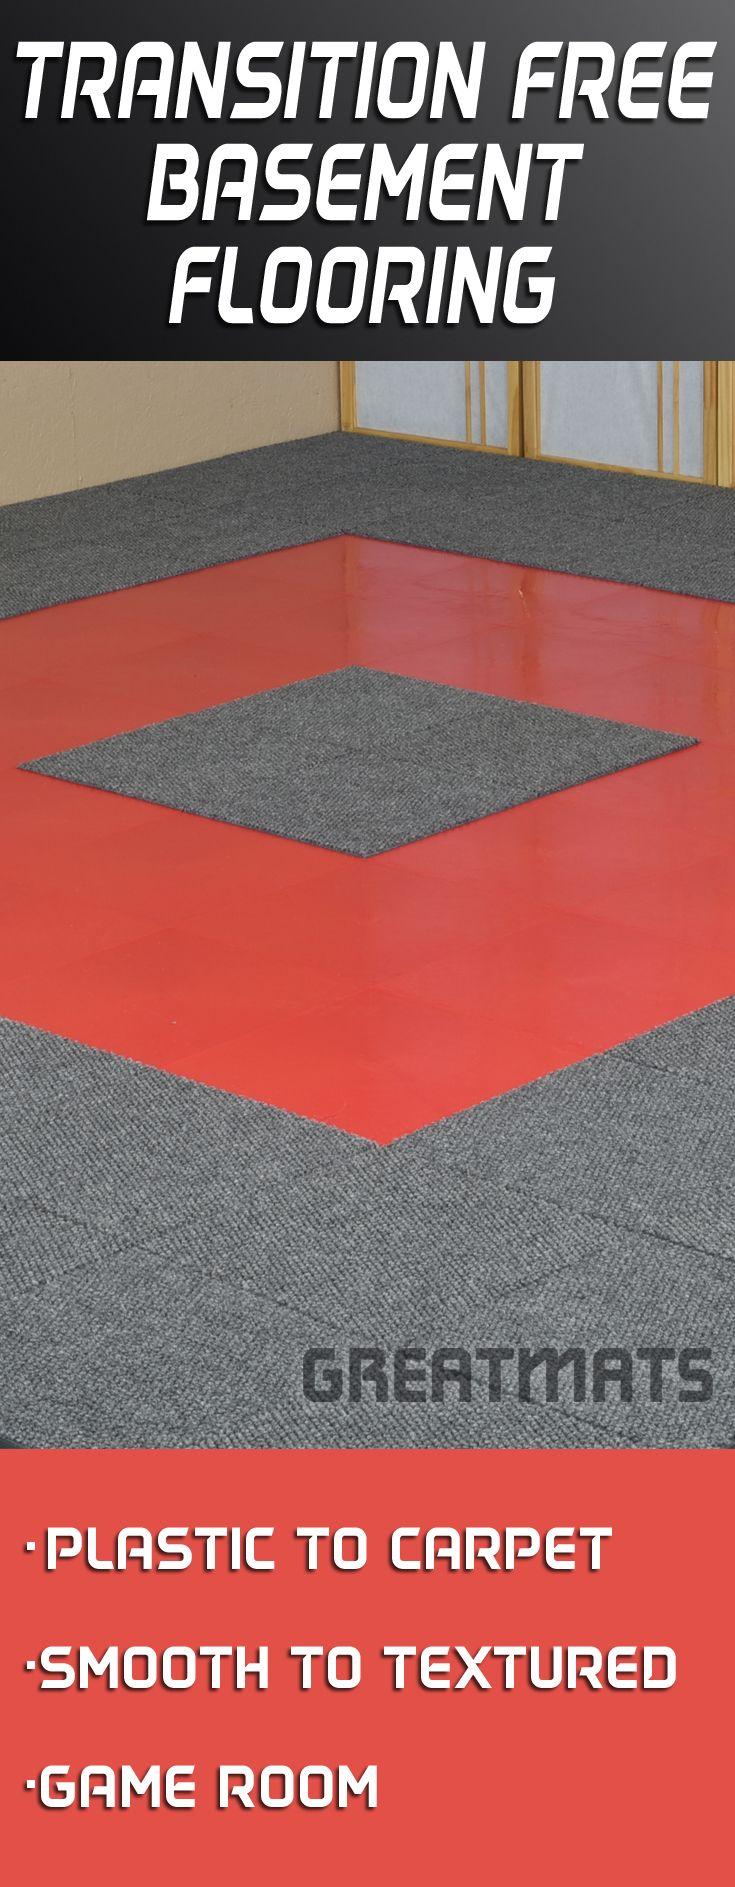 45 Best Images About Basement Flooring On Pinterest